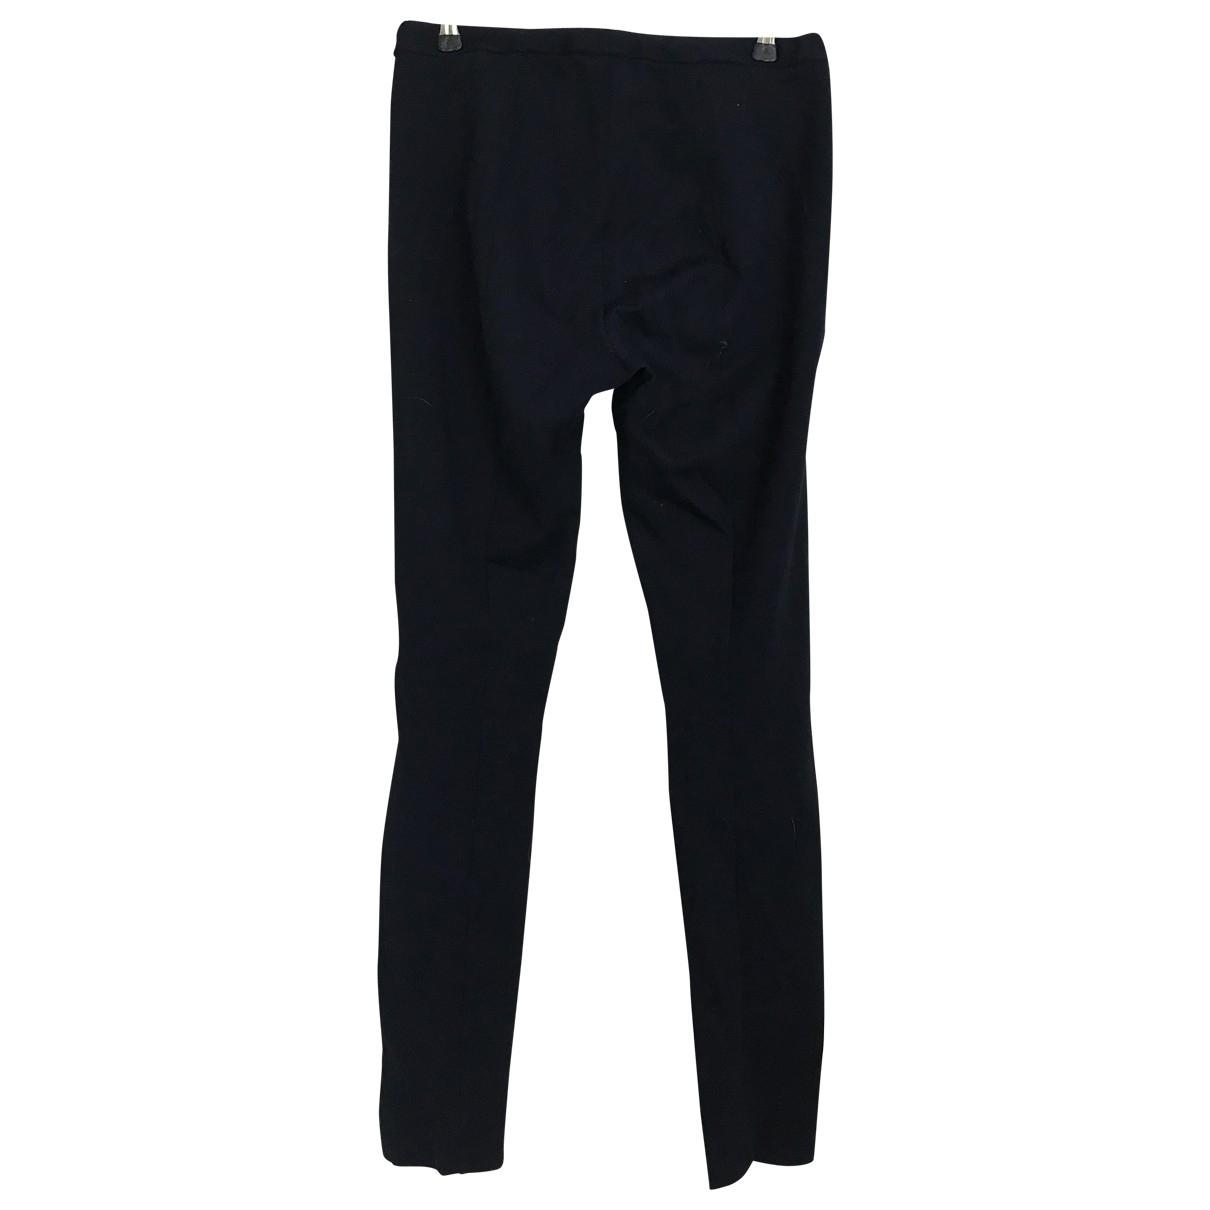 Emporio Armani \N Black Cotton Trousers for Women 42 IT